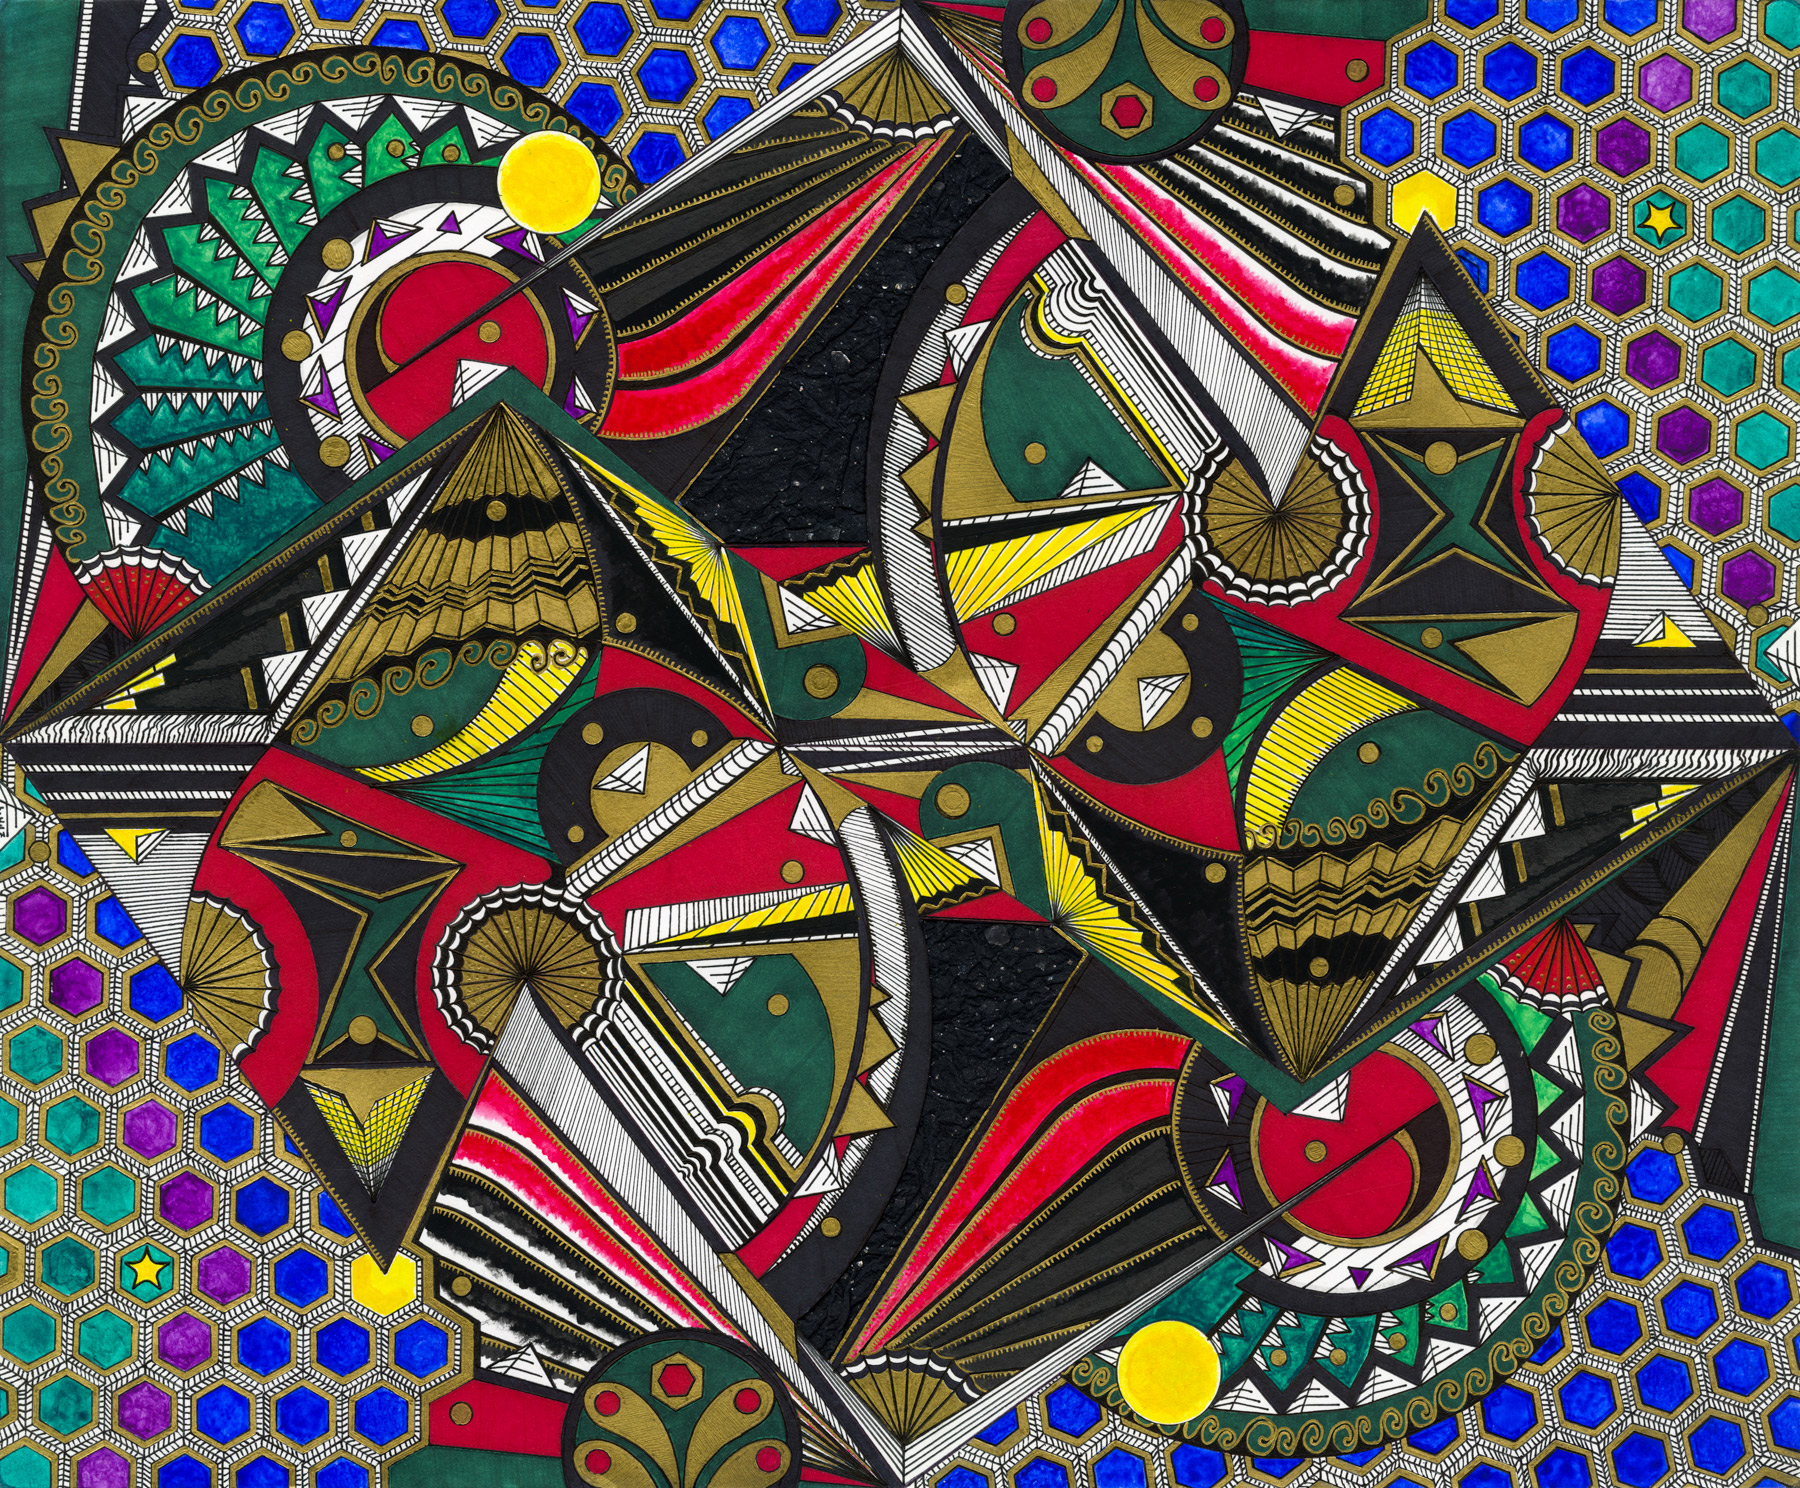 panAfricanFlag.jpg